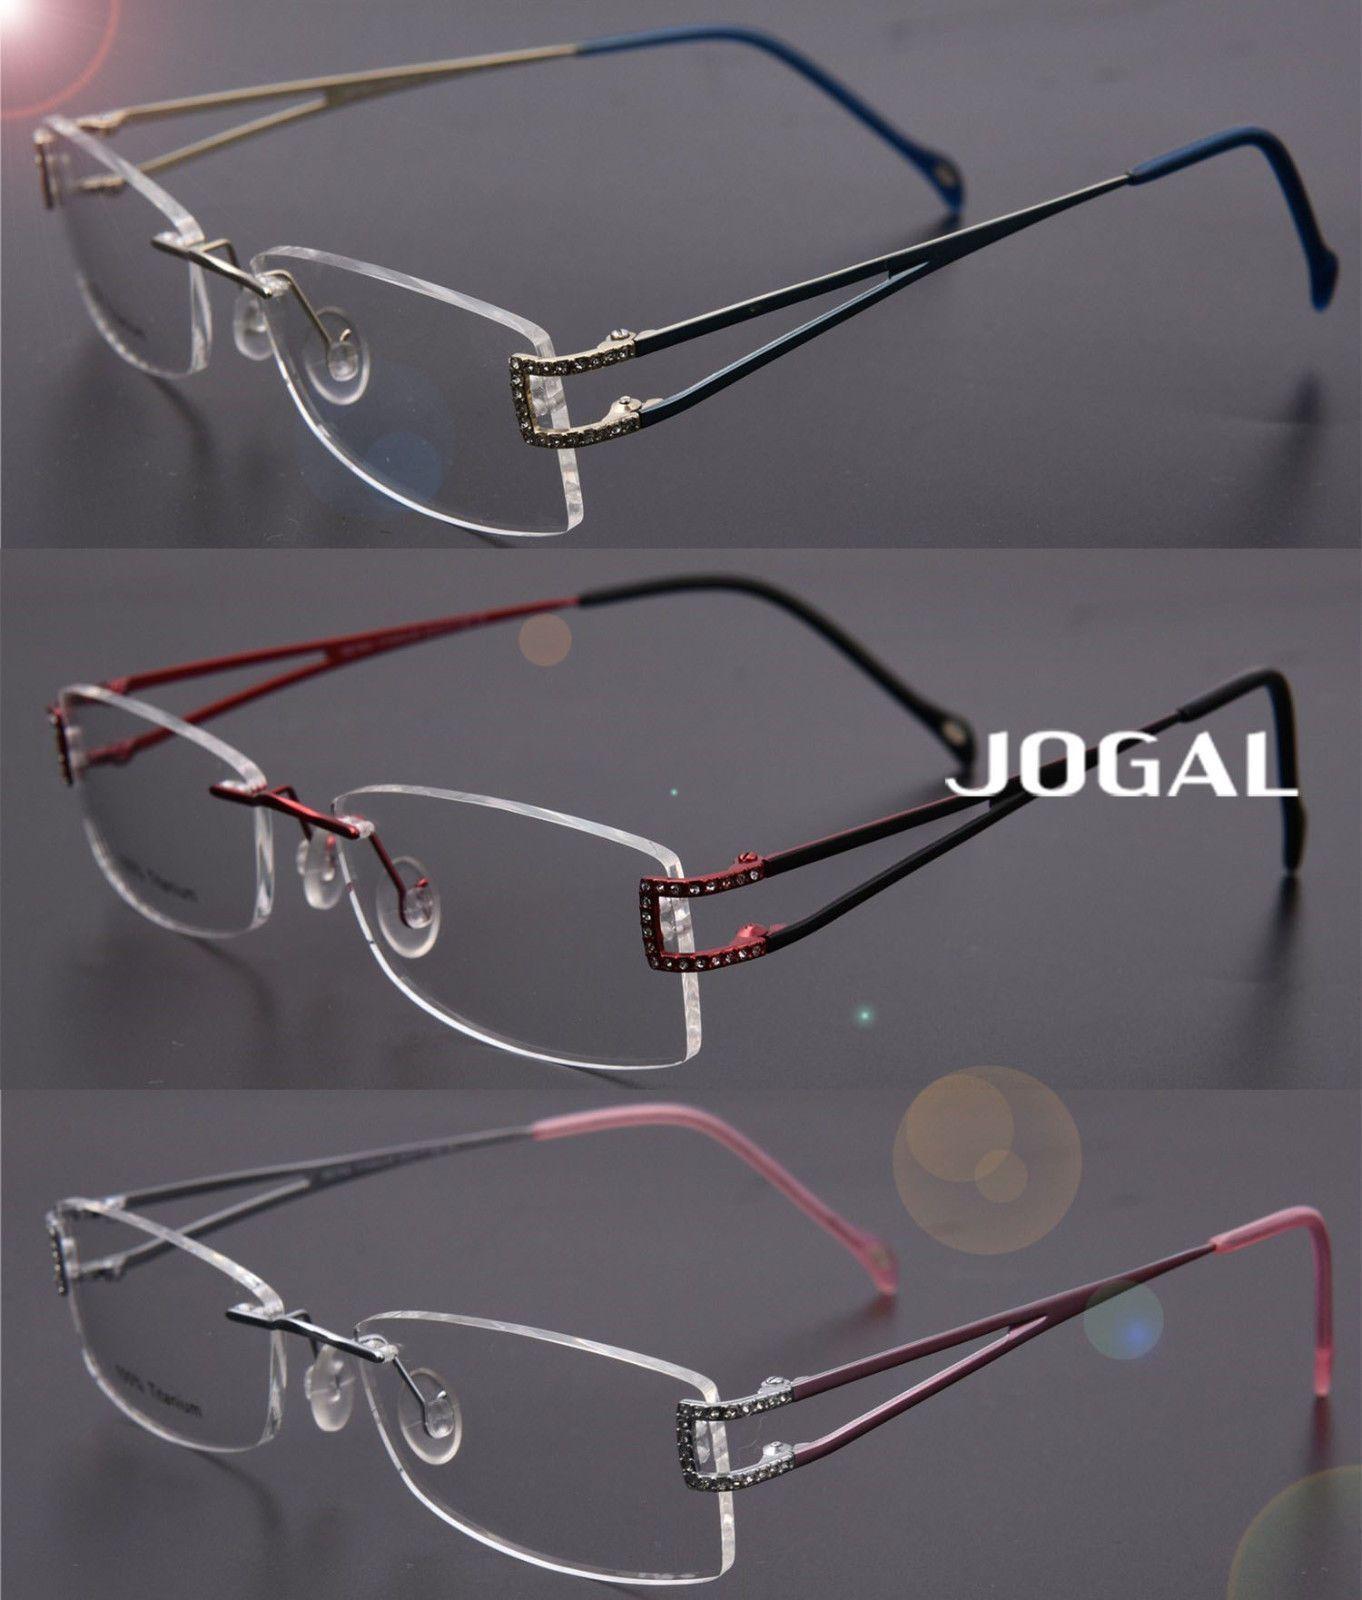 1f99724739 Womens Luxury -Titanium Rimless Glasses Eyewear Eyeglasses Frame Super Light